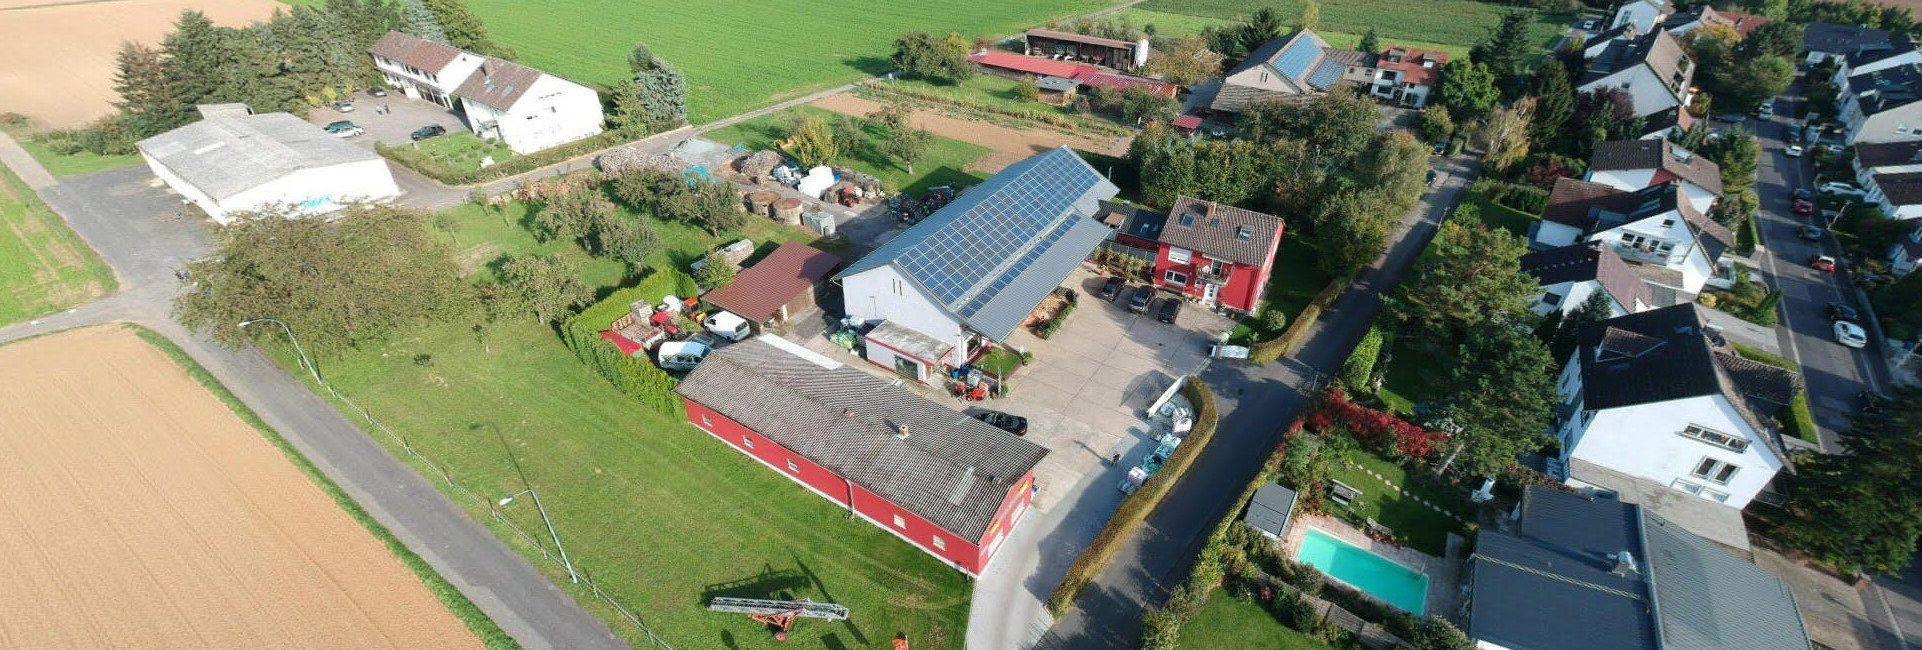 Volk Gartentechnik - Luftbild